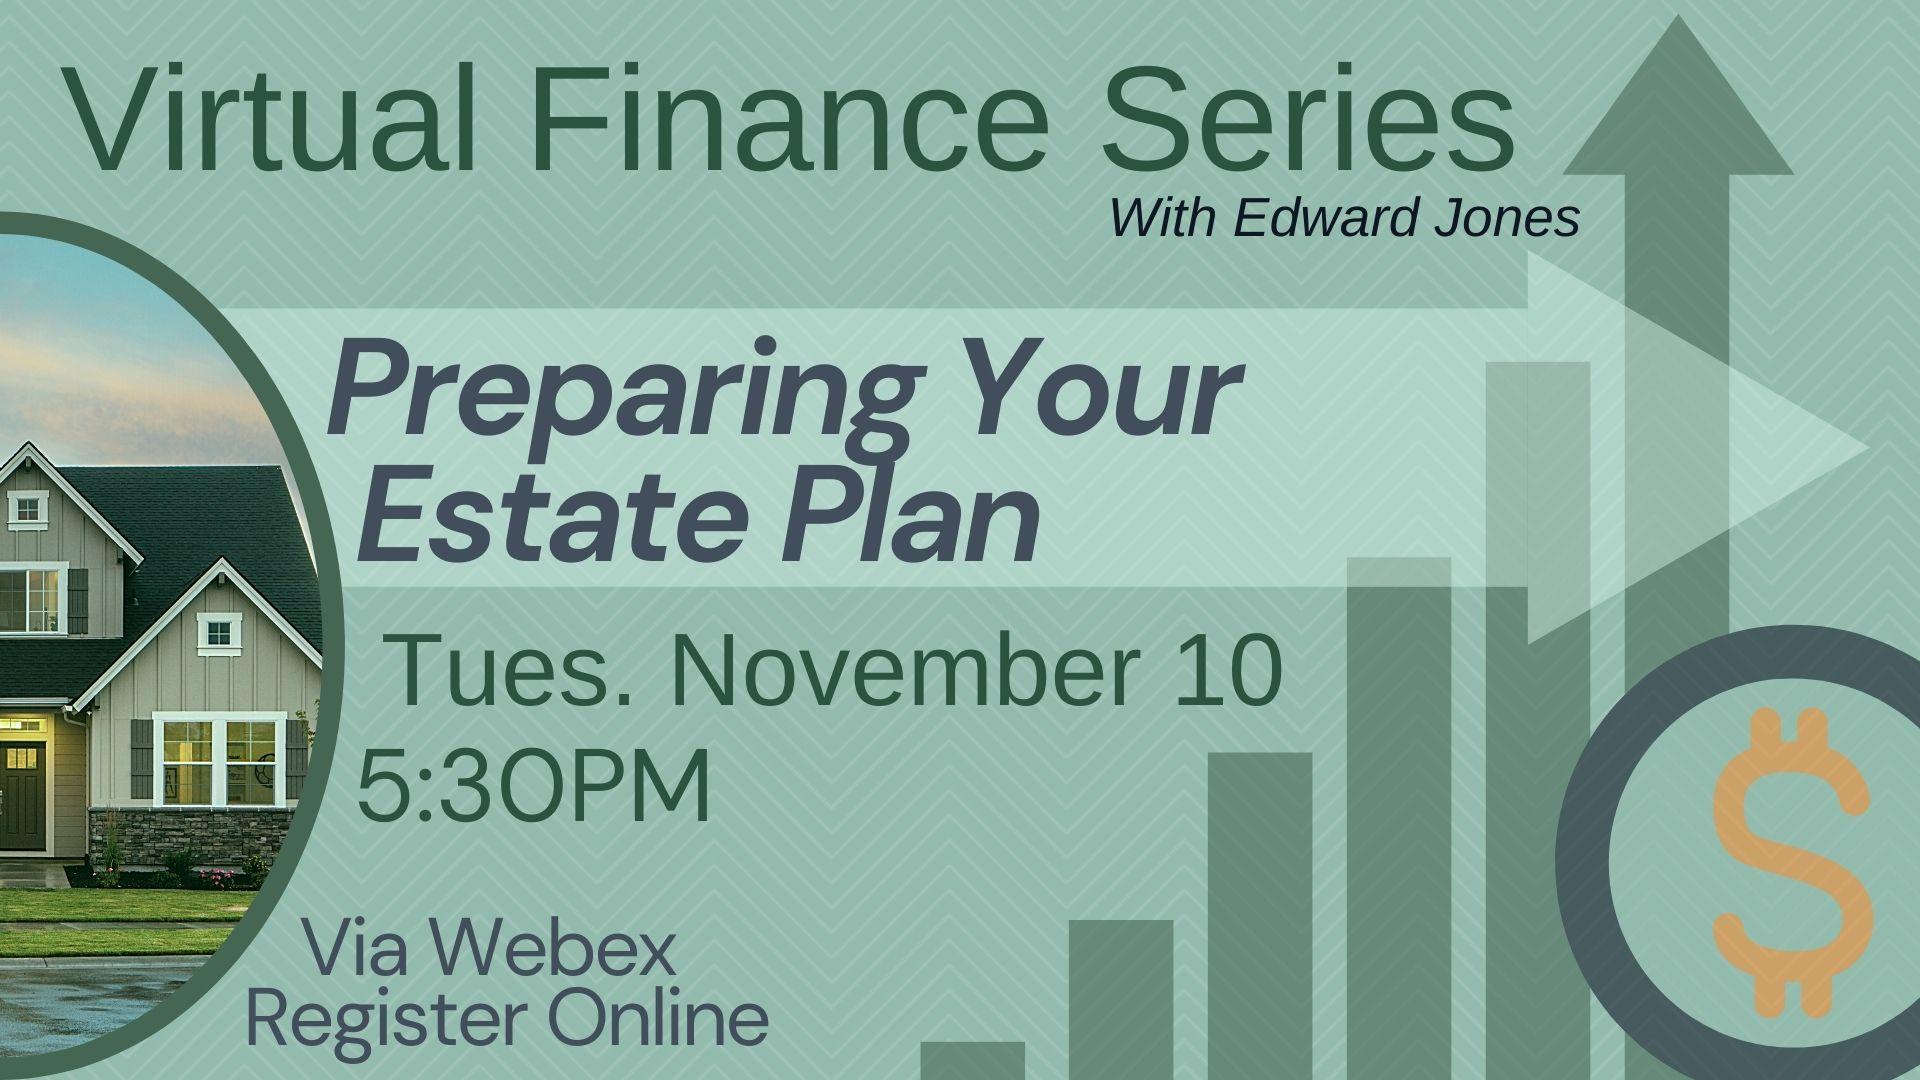 Virtual Finance Series: Preparing Your Estate Plan